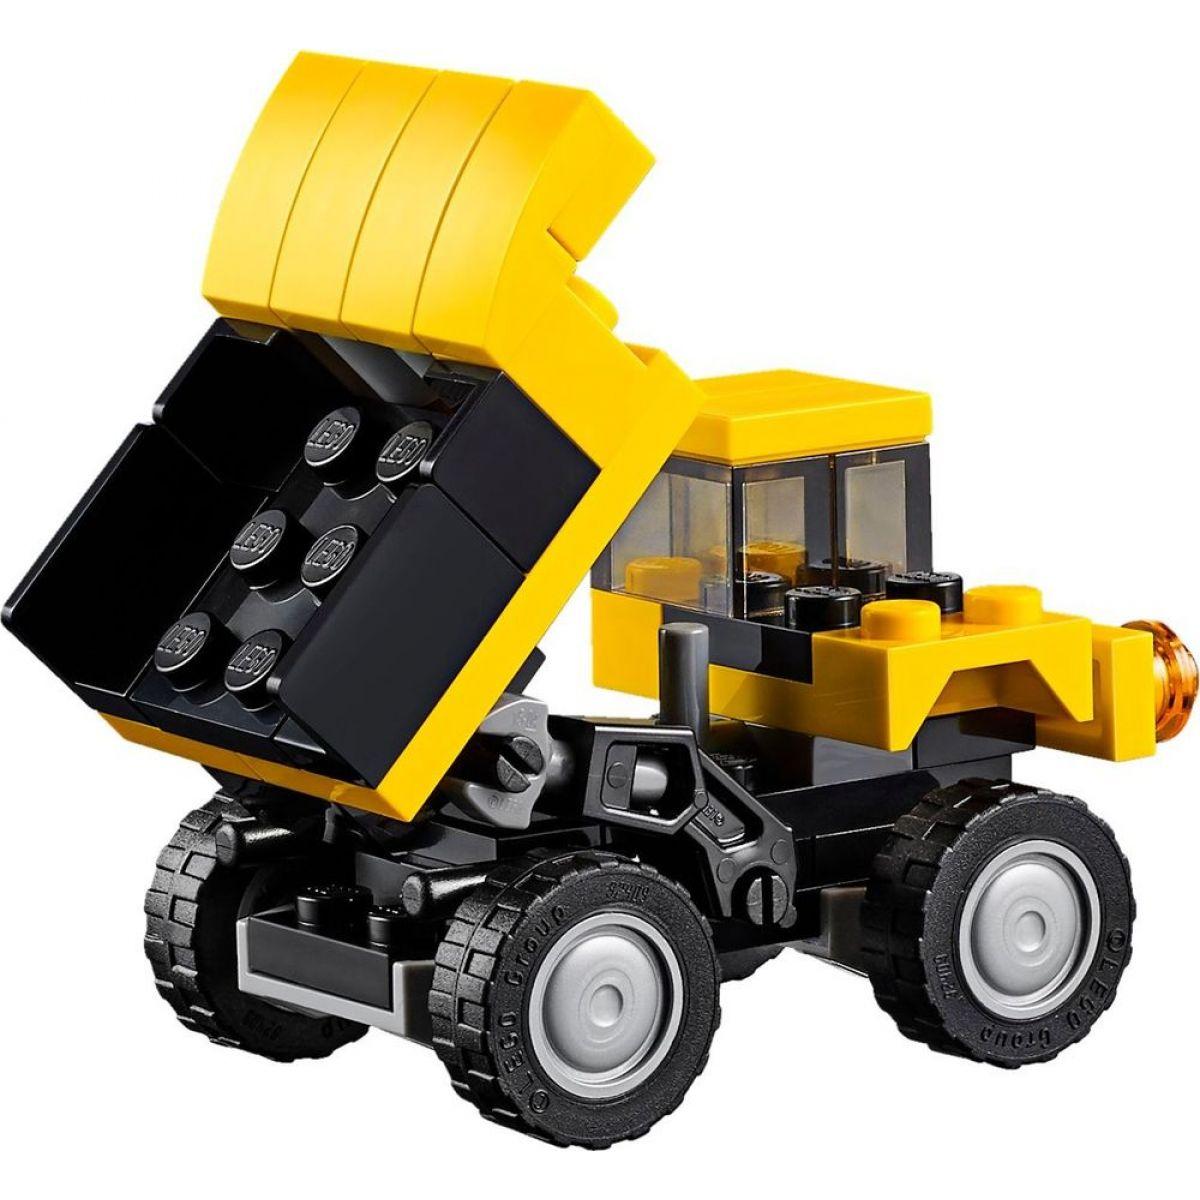 LEGO Creator 31041 Vozidla na stavbě #7